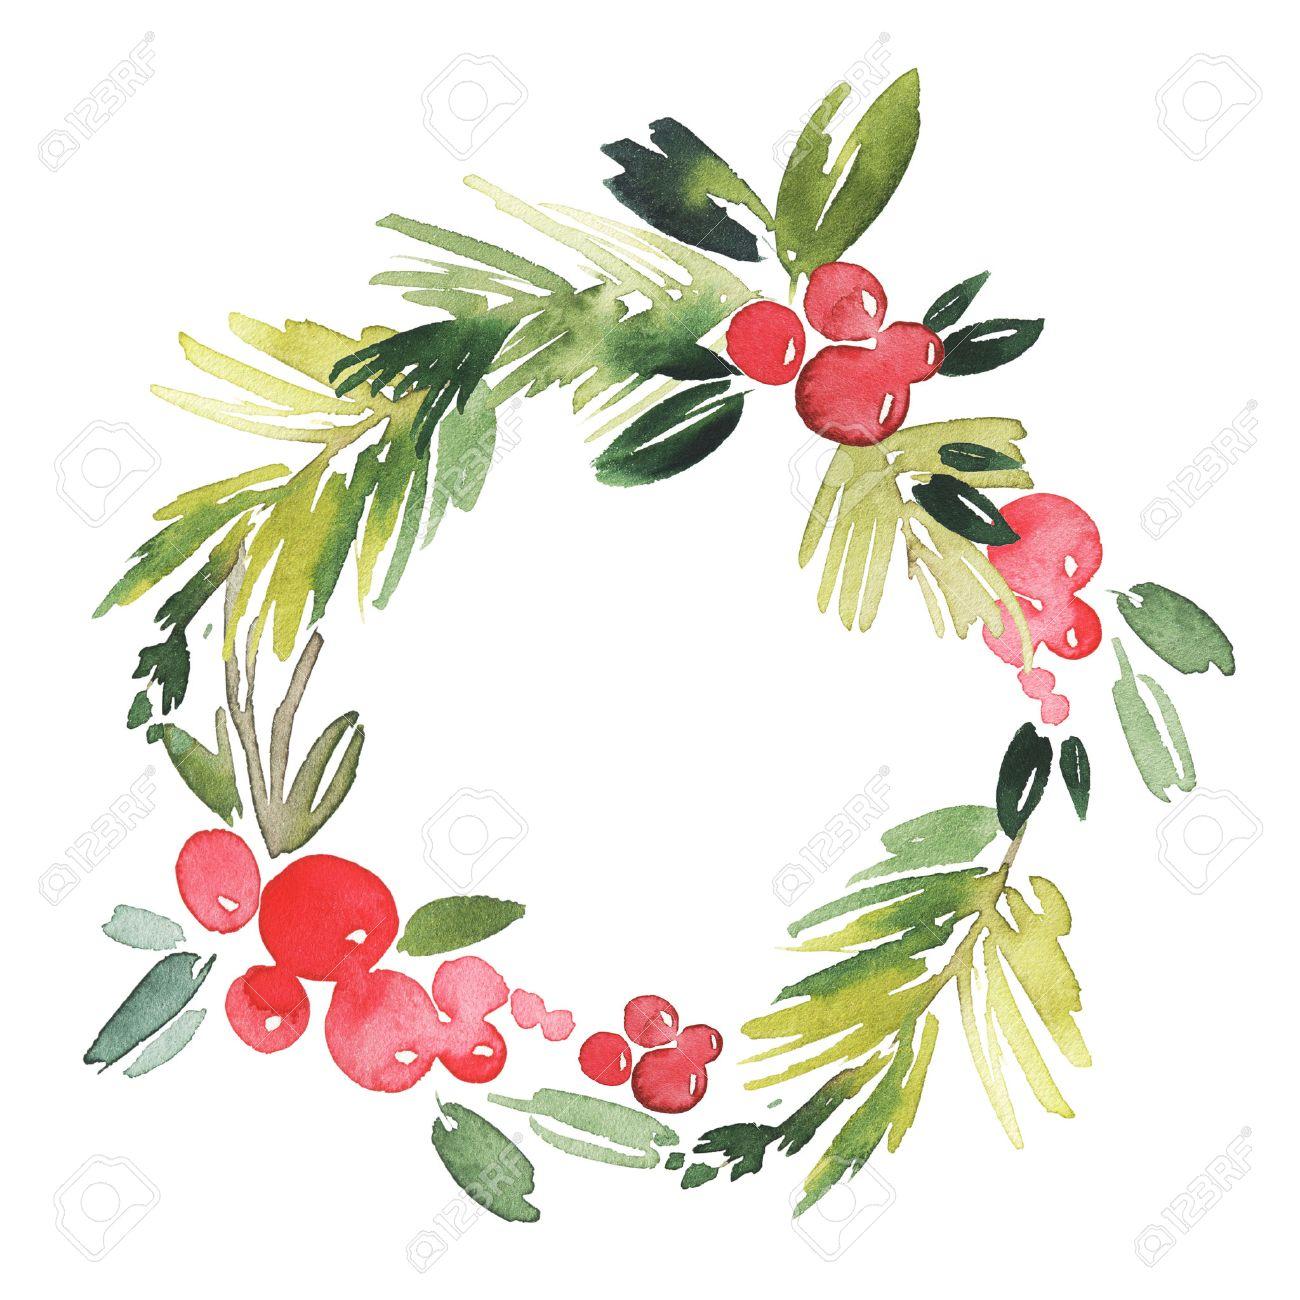 Christmas Wreath Watercolor Handmade Holiday Card Stock Photo